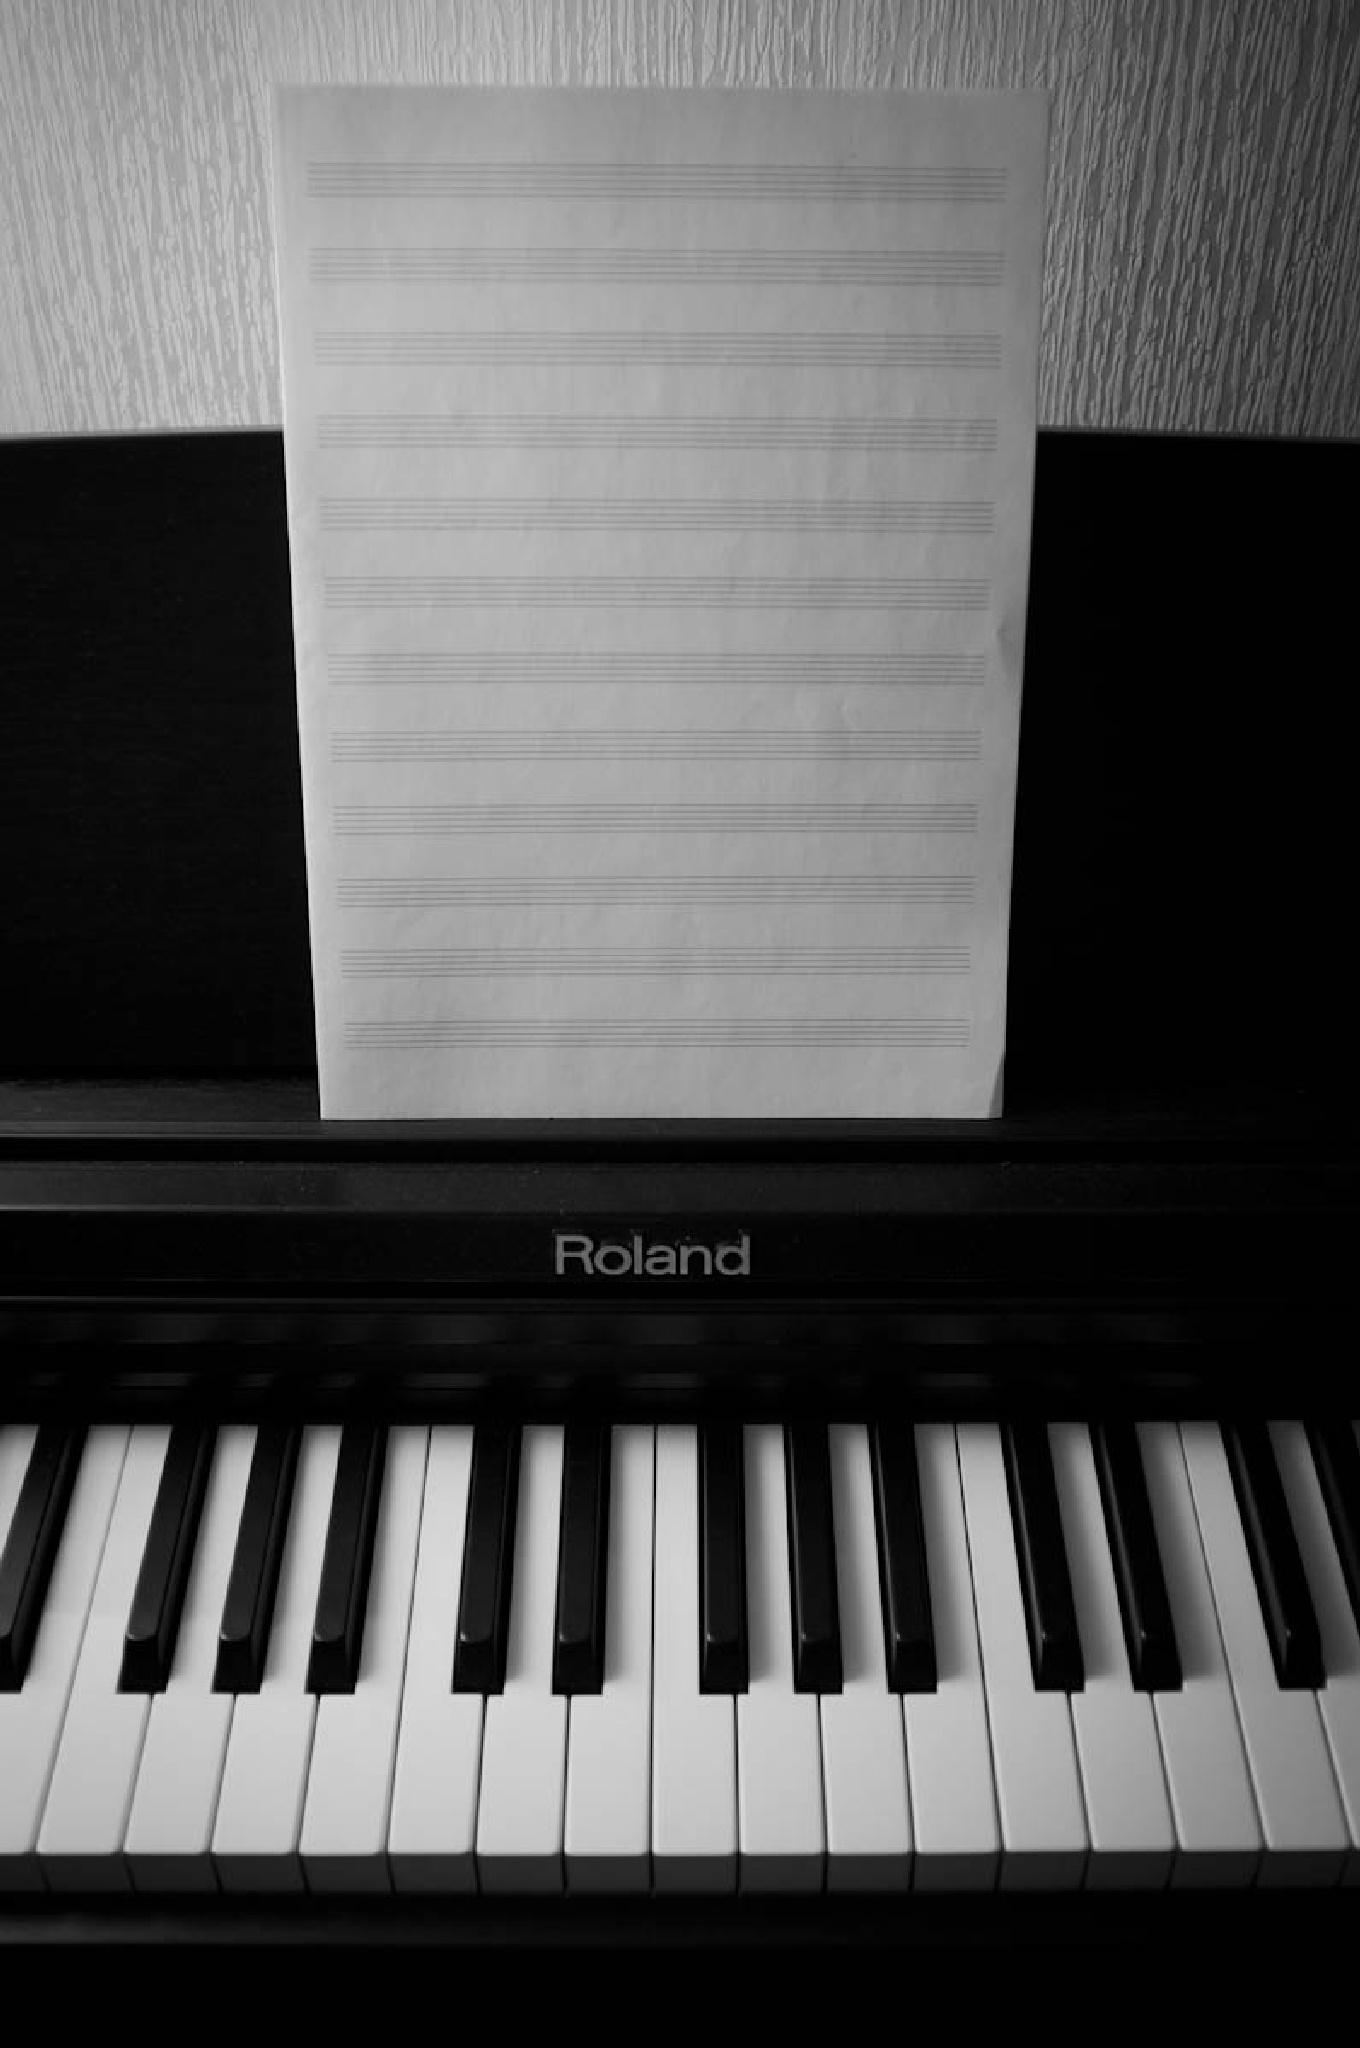 Improvisation by Harri_1970